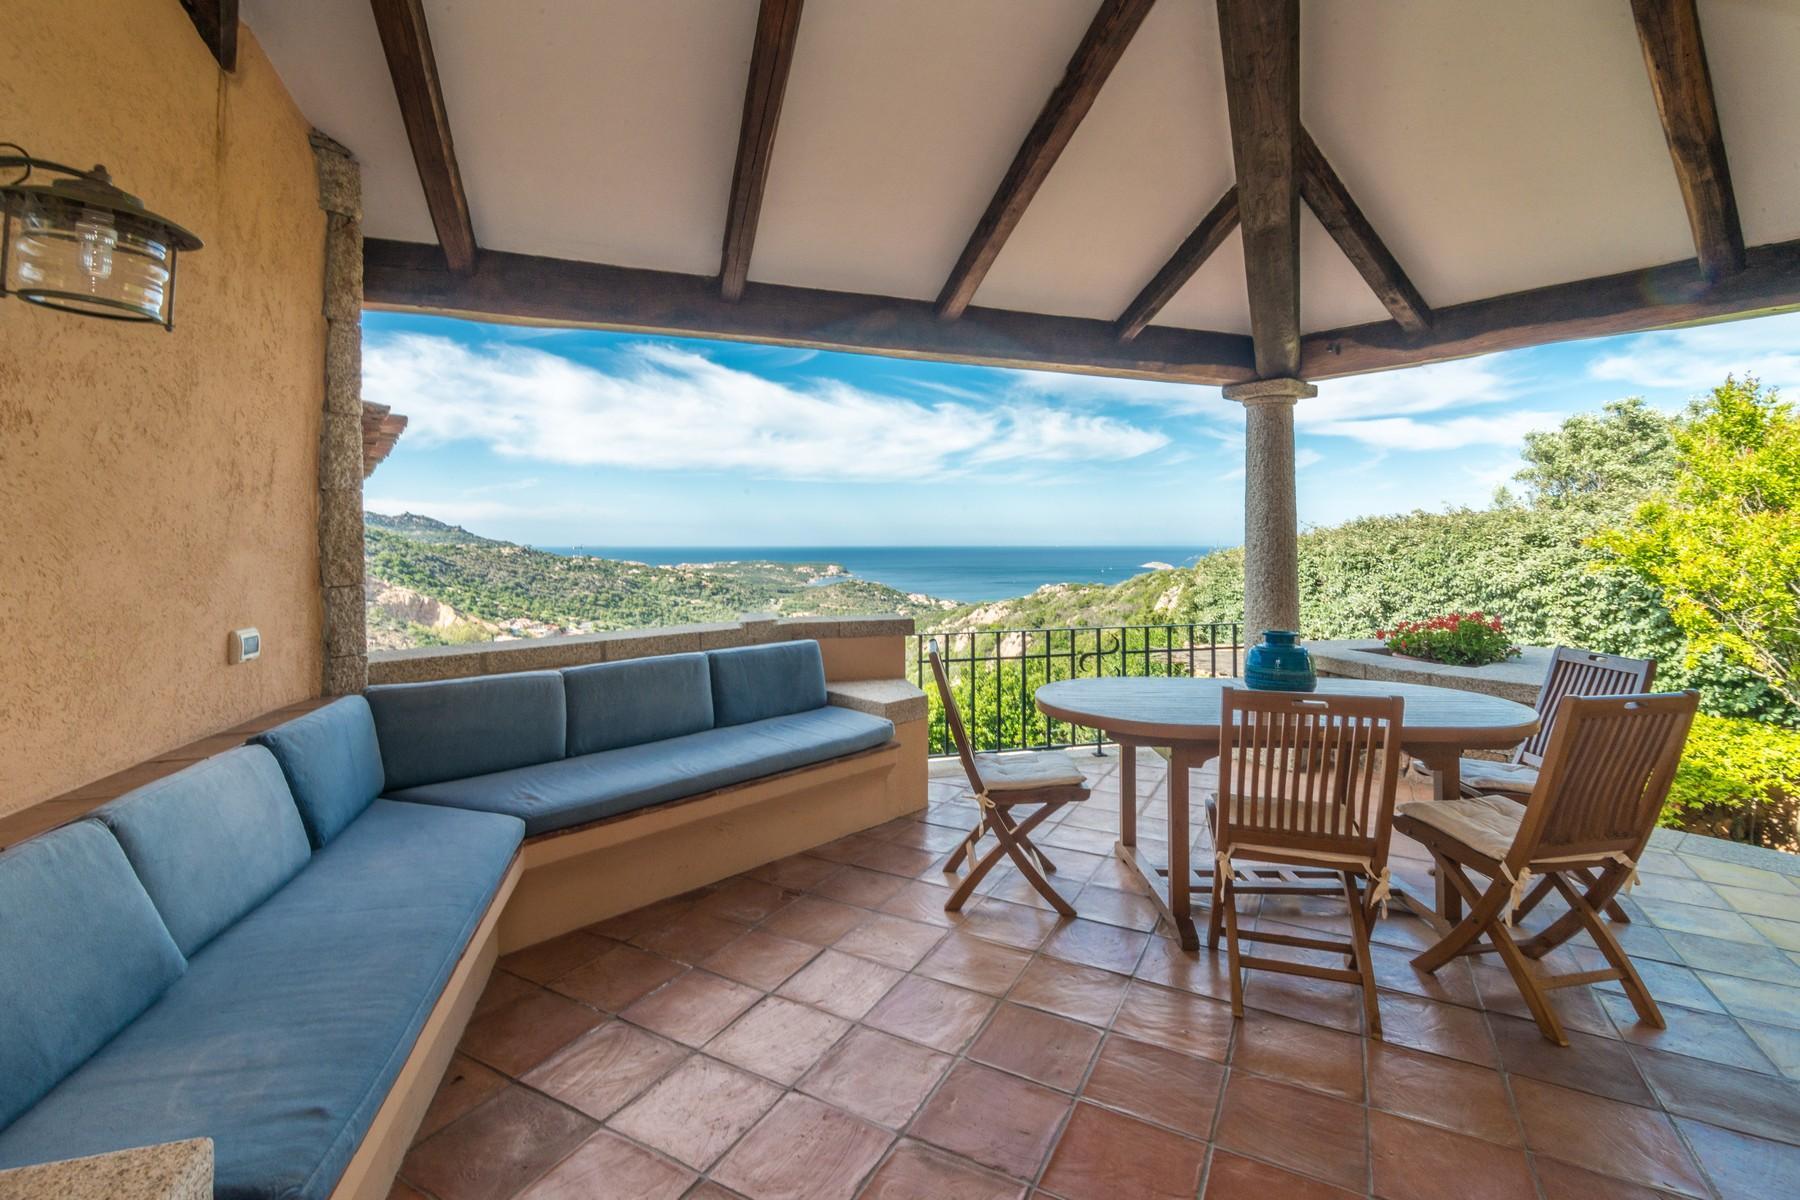 Porto Cervo Abbiadori Splendide villa jumelée avec vue sur le golfe de Pevero - 9